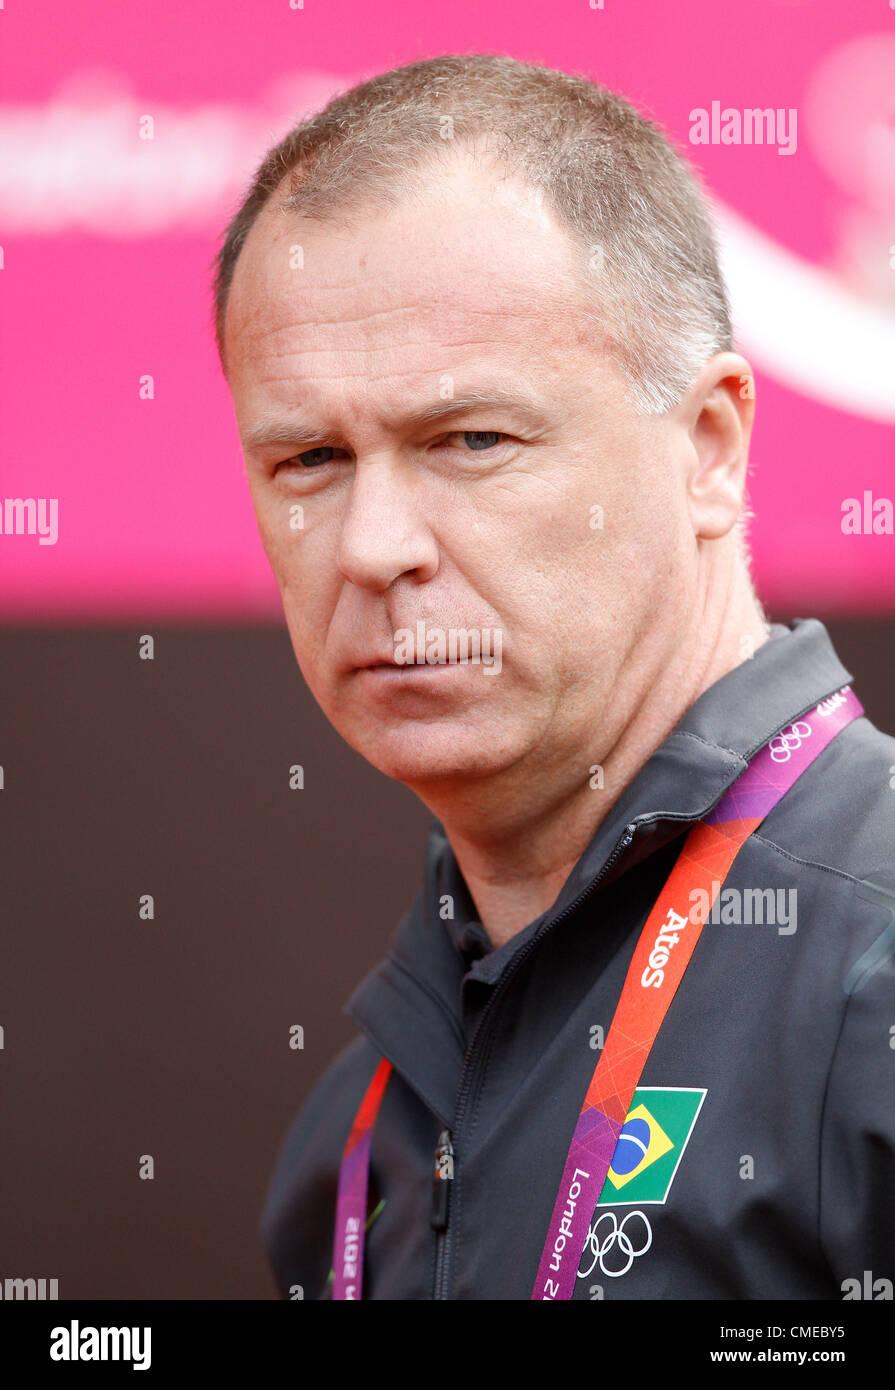 MANO MENEZES (coach) Brasil, Old Trafford, Manchester, Inglaterra el 29 de julio de 2012 Imagen De Stock